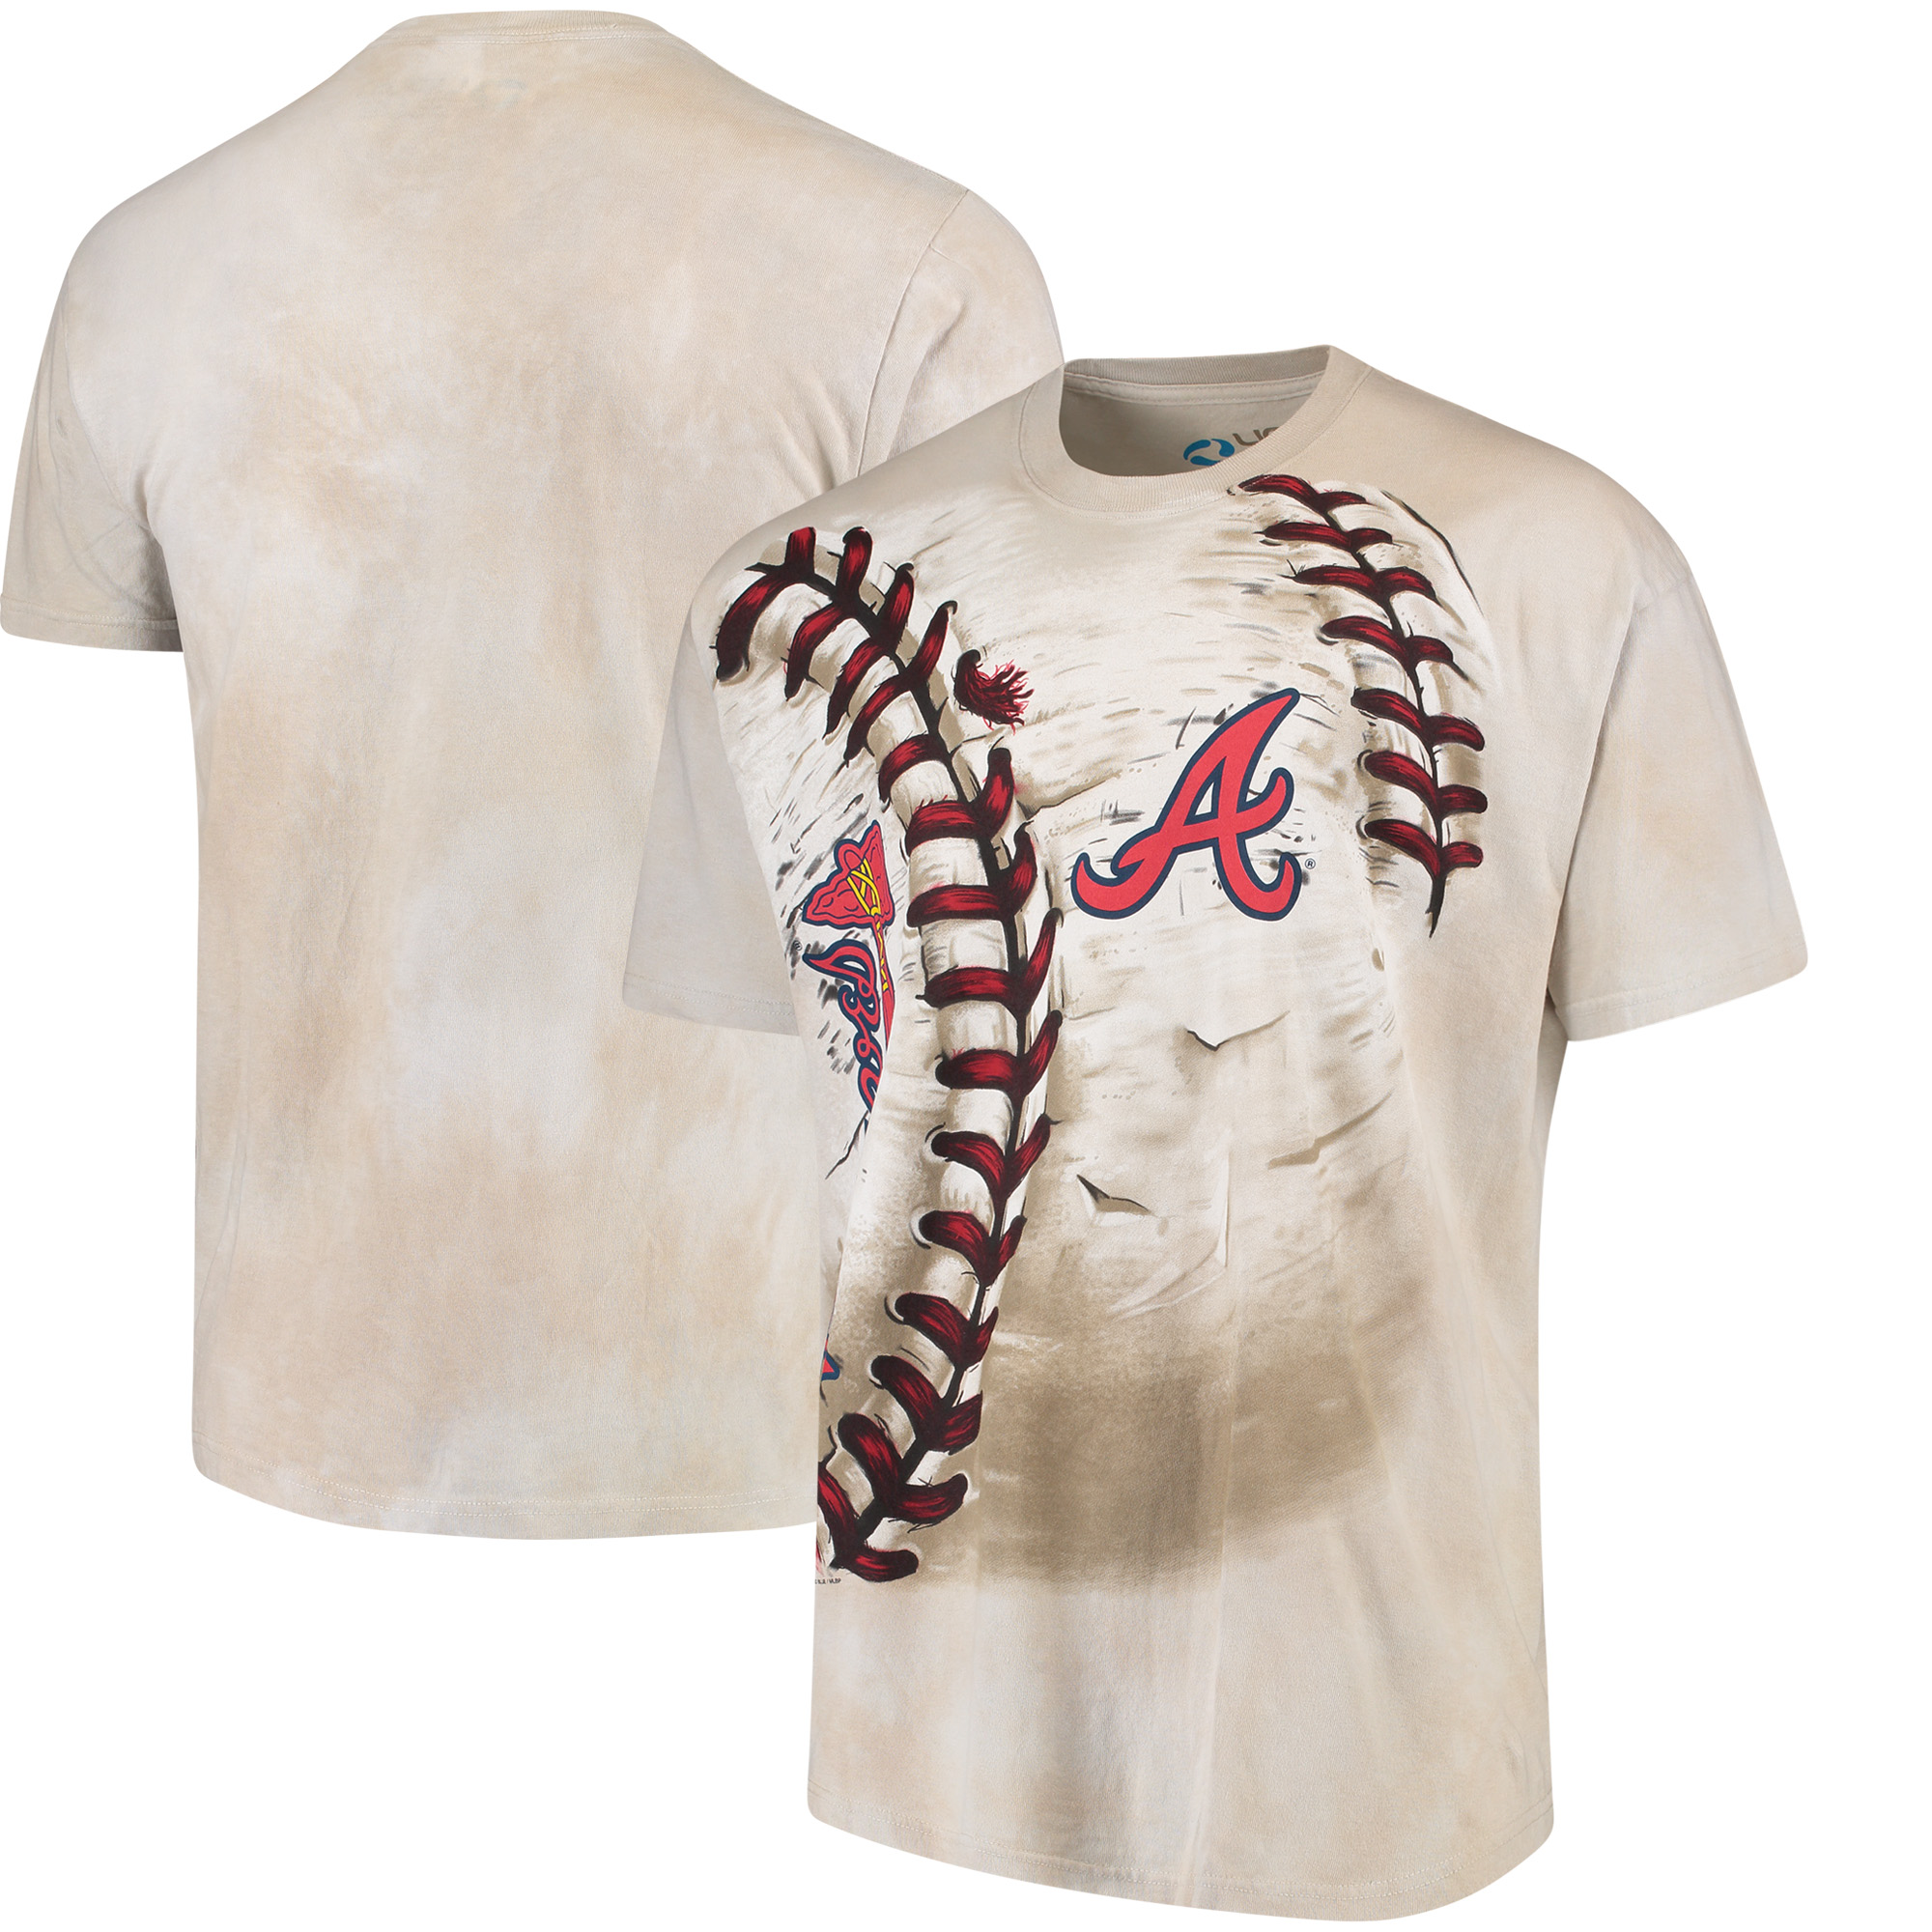 Atlanta Braves Hardball Tie-Dye T-Shirt - Cream